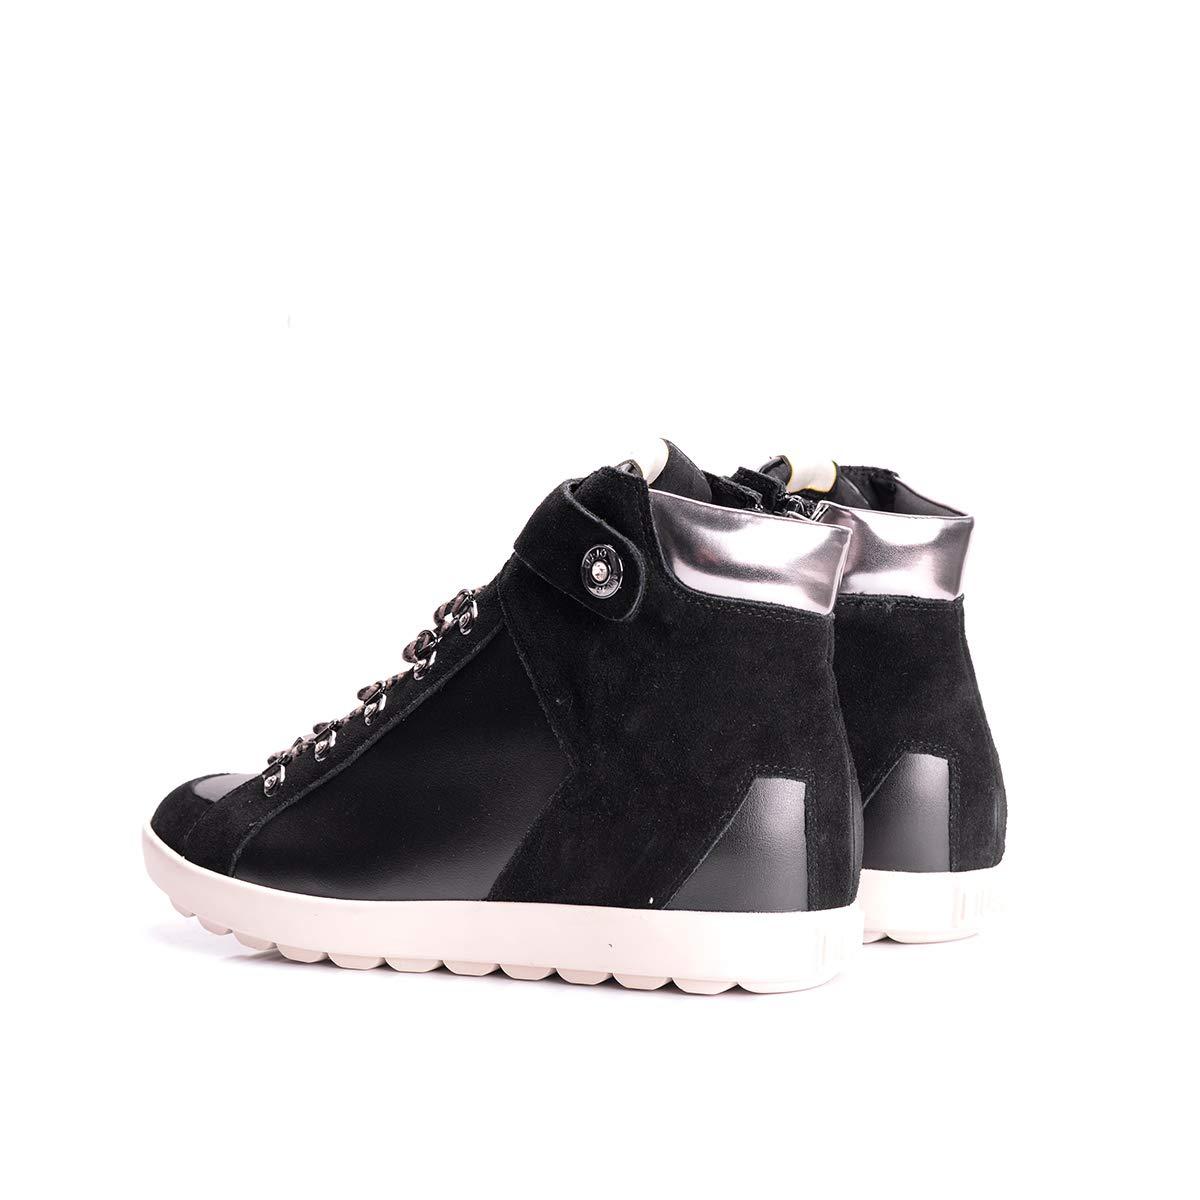 Liu-Jo Sneaker Coralie S65123 - S65123 Coralie P0079 / Seaker Alta Coralie - SIZE: 41(EU) - f6ef79